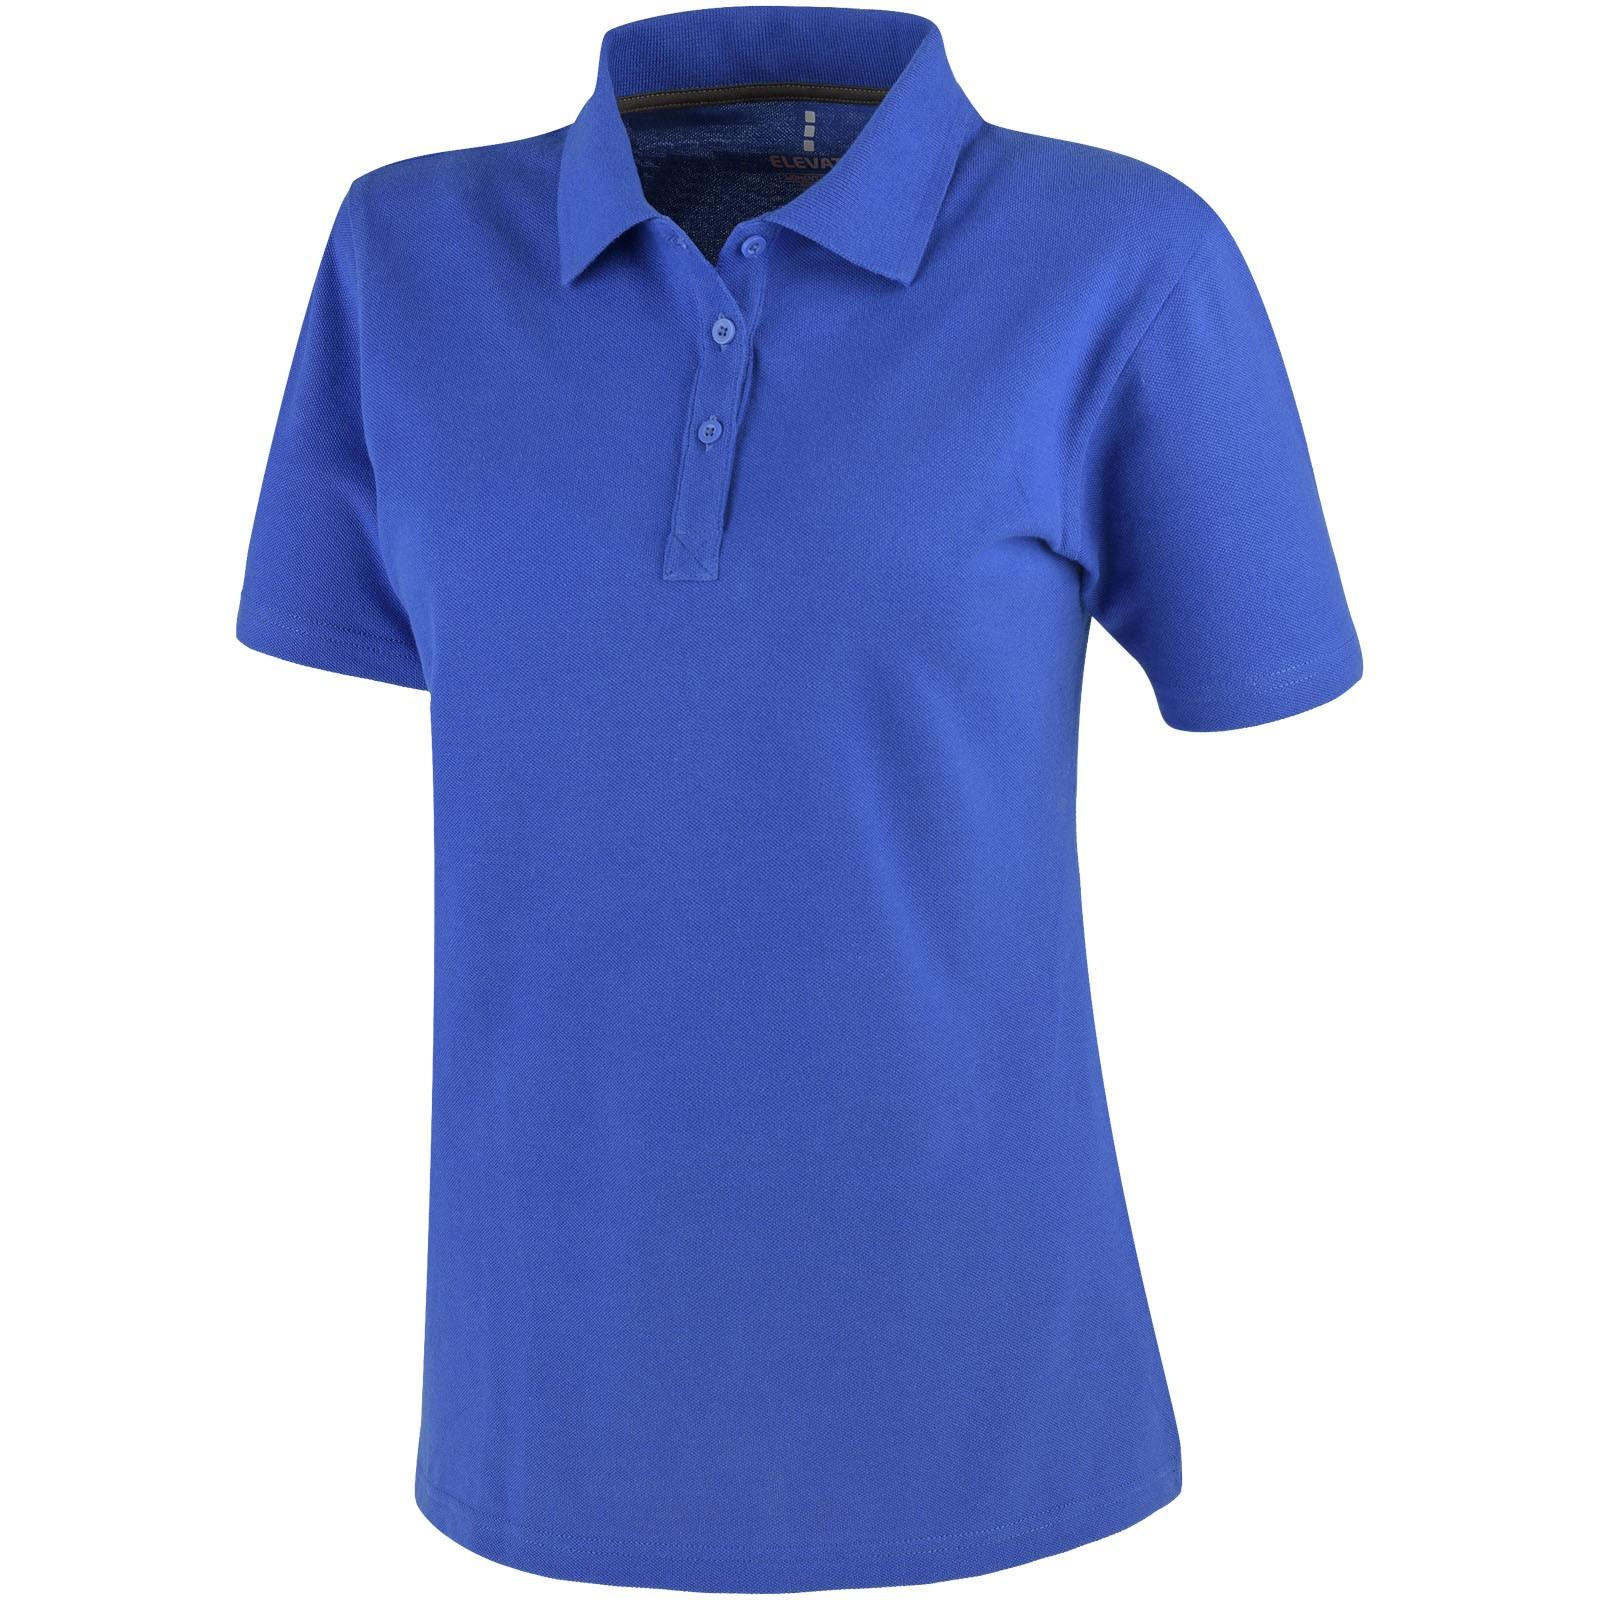 Primus short sleeve women's polo - Blue / XL